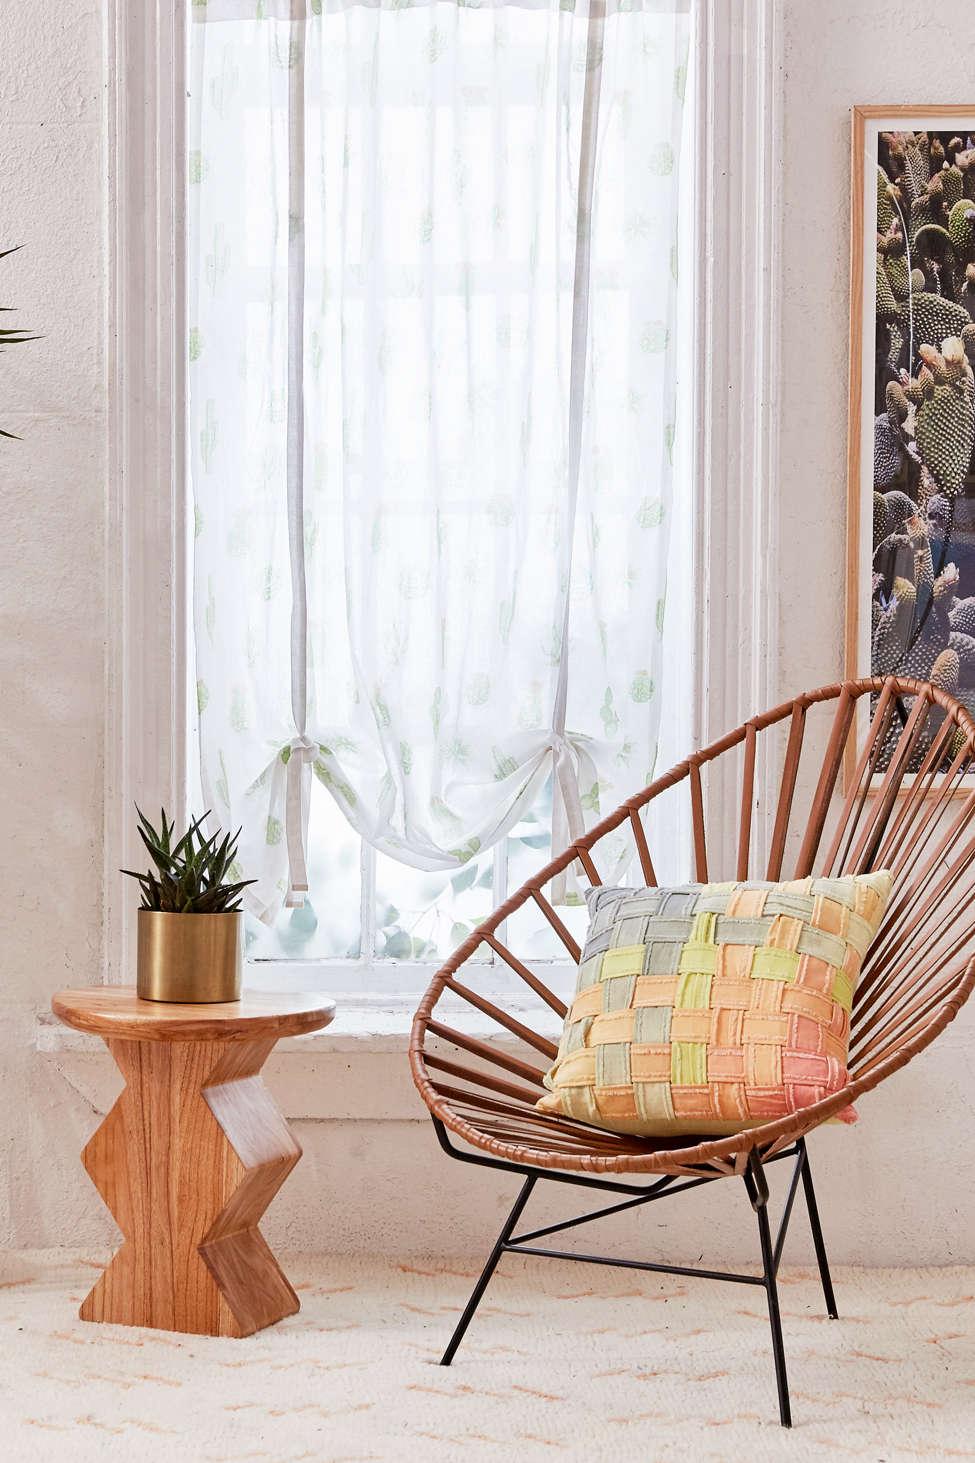 Slide View: 1: Cactus Draped Shade Curtain